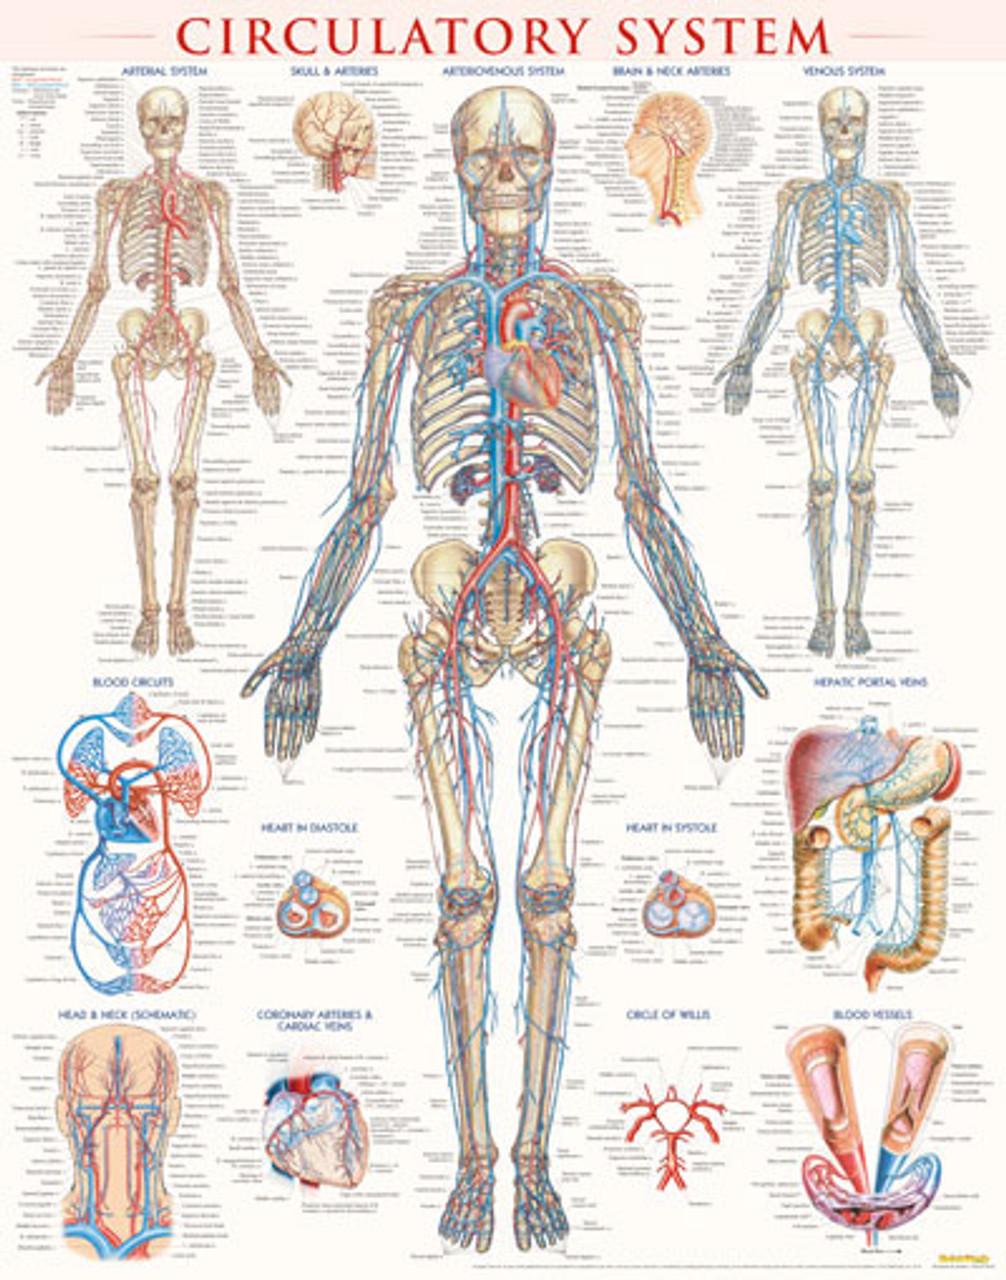 Circulatory System Anatomy Poster